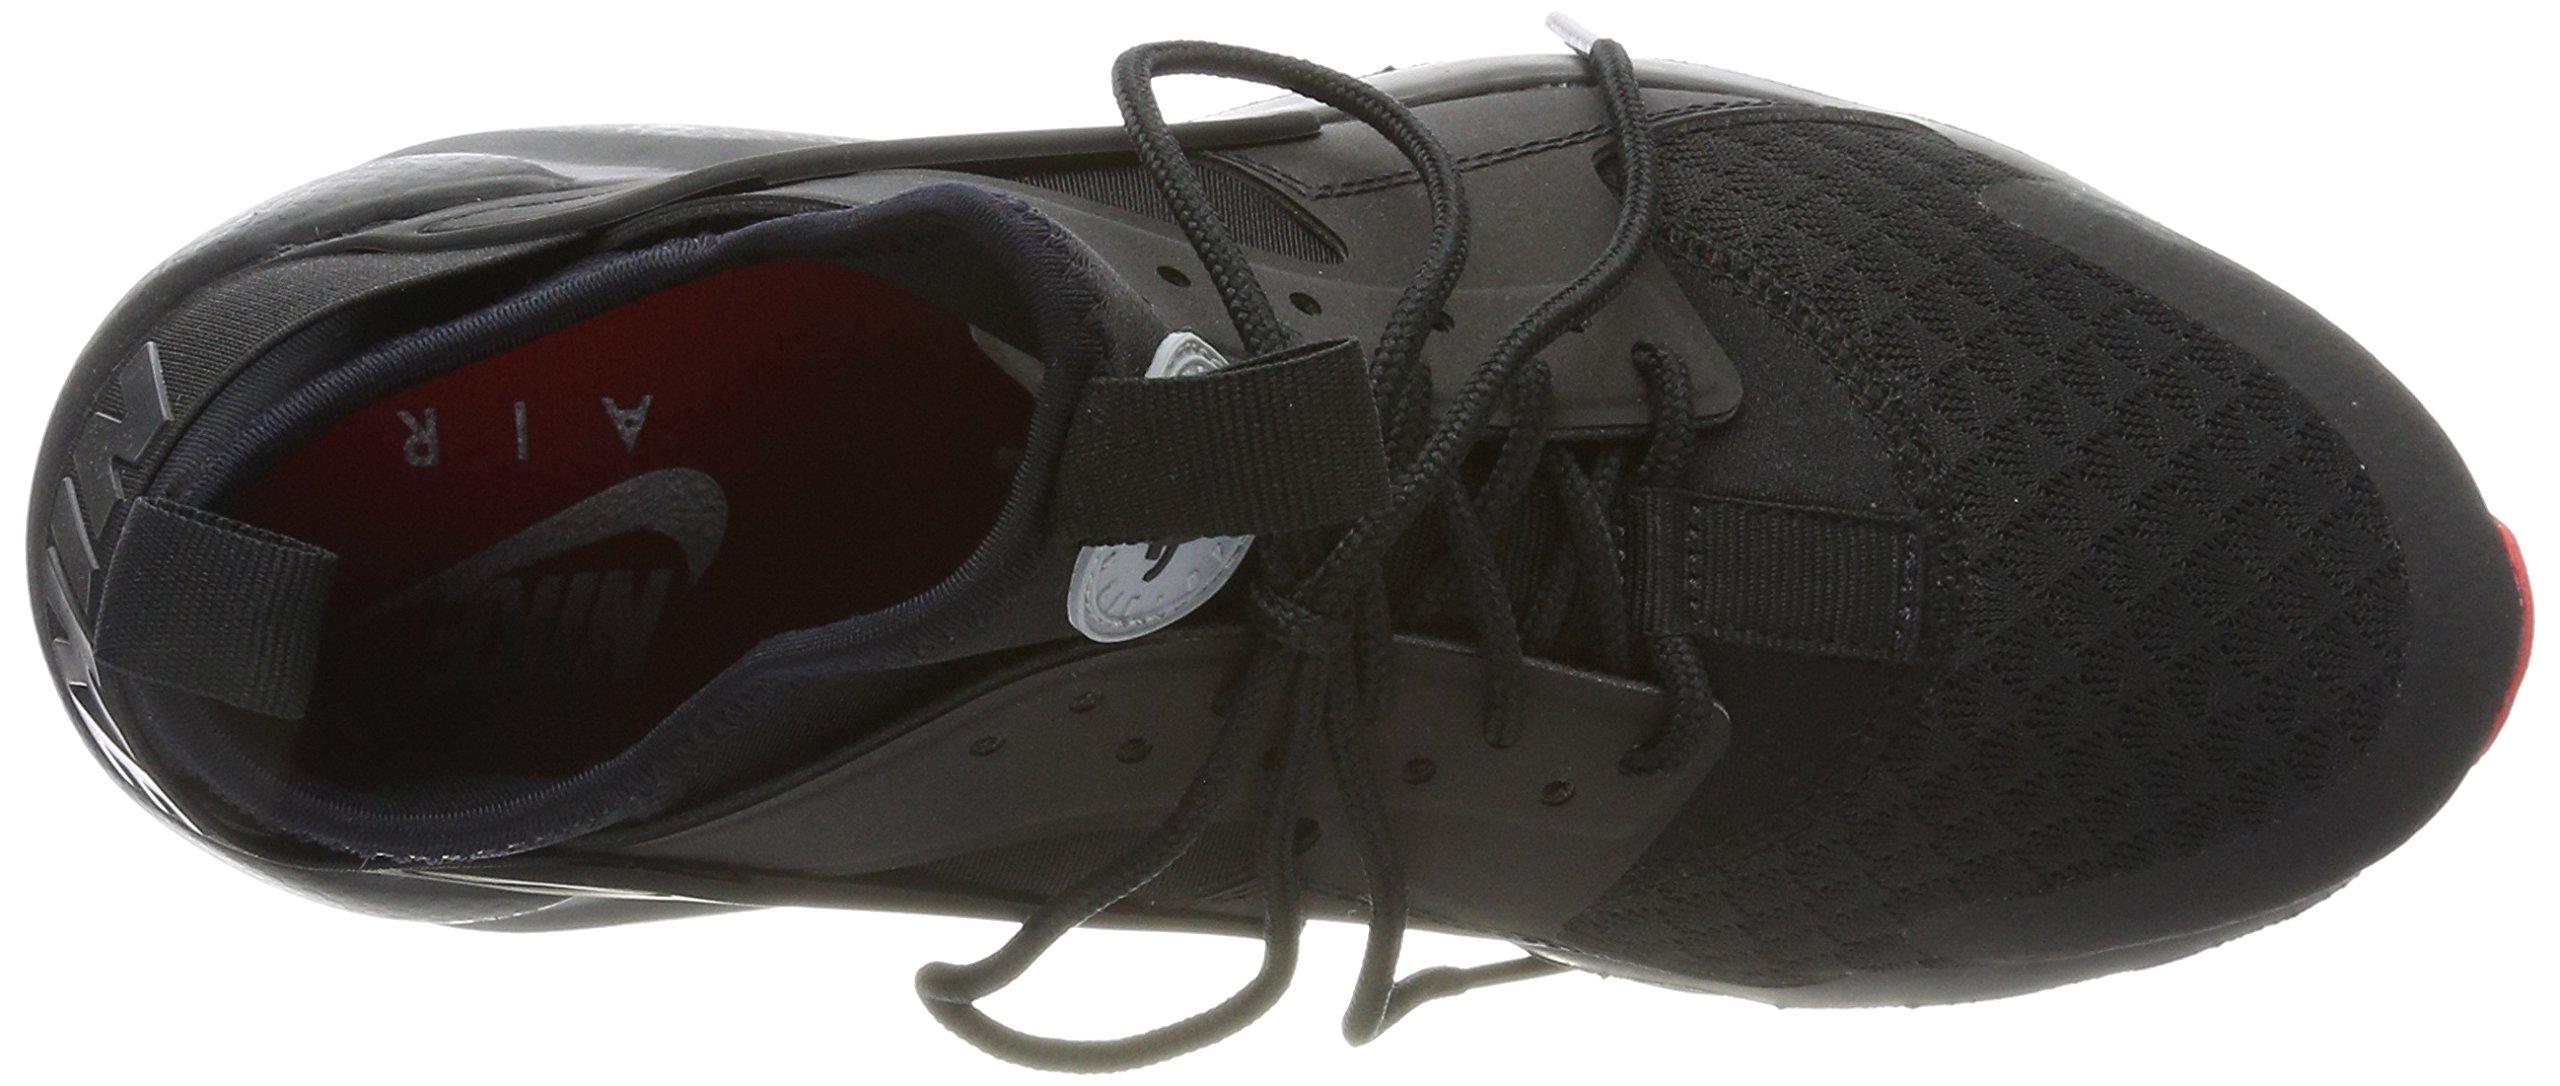 Nike Air Huarache Run Ultra Black/Metallic Silver (11 D(M) US) by NIKE (Image #7)